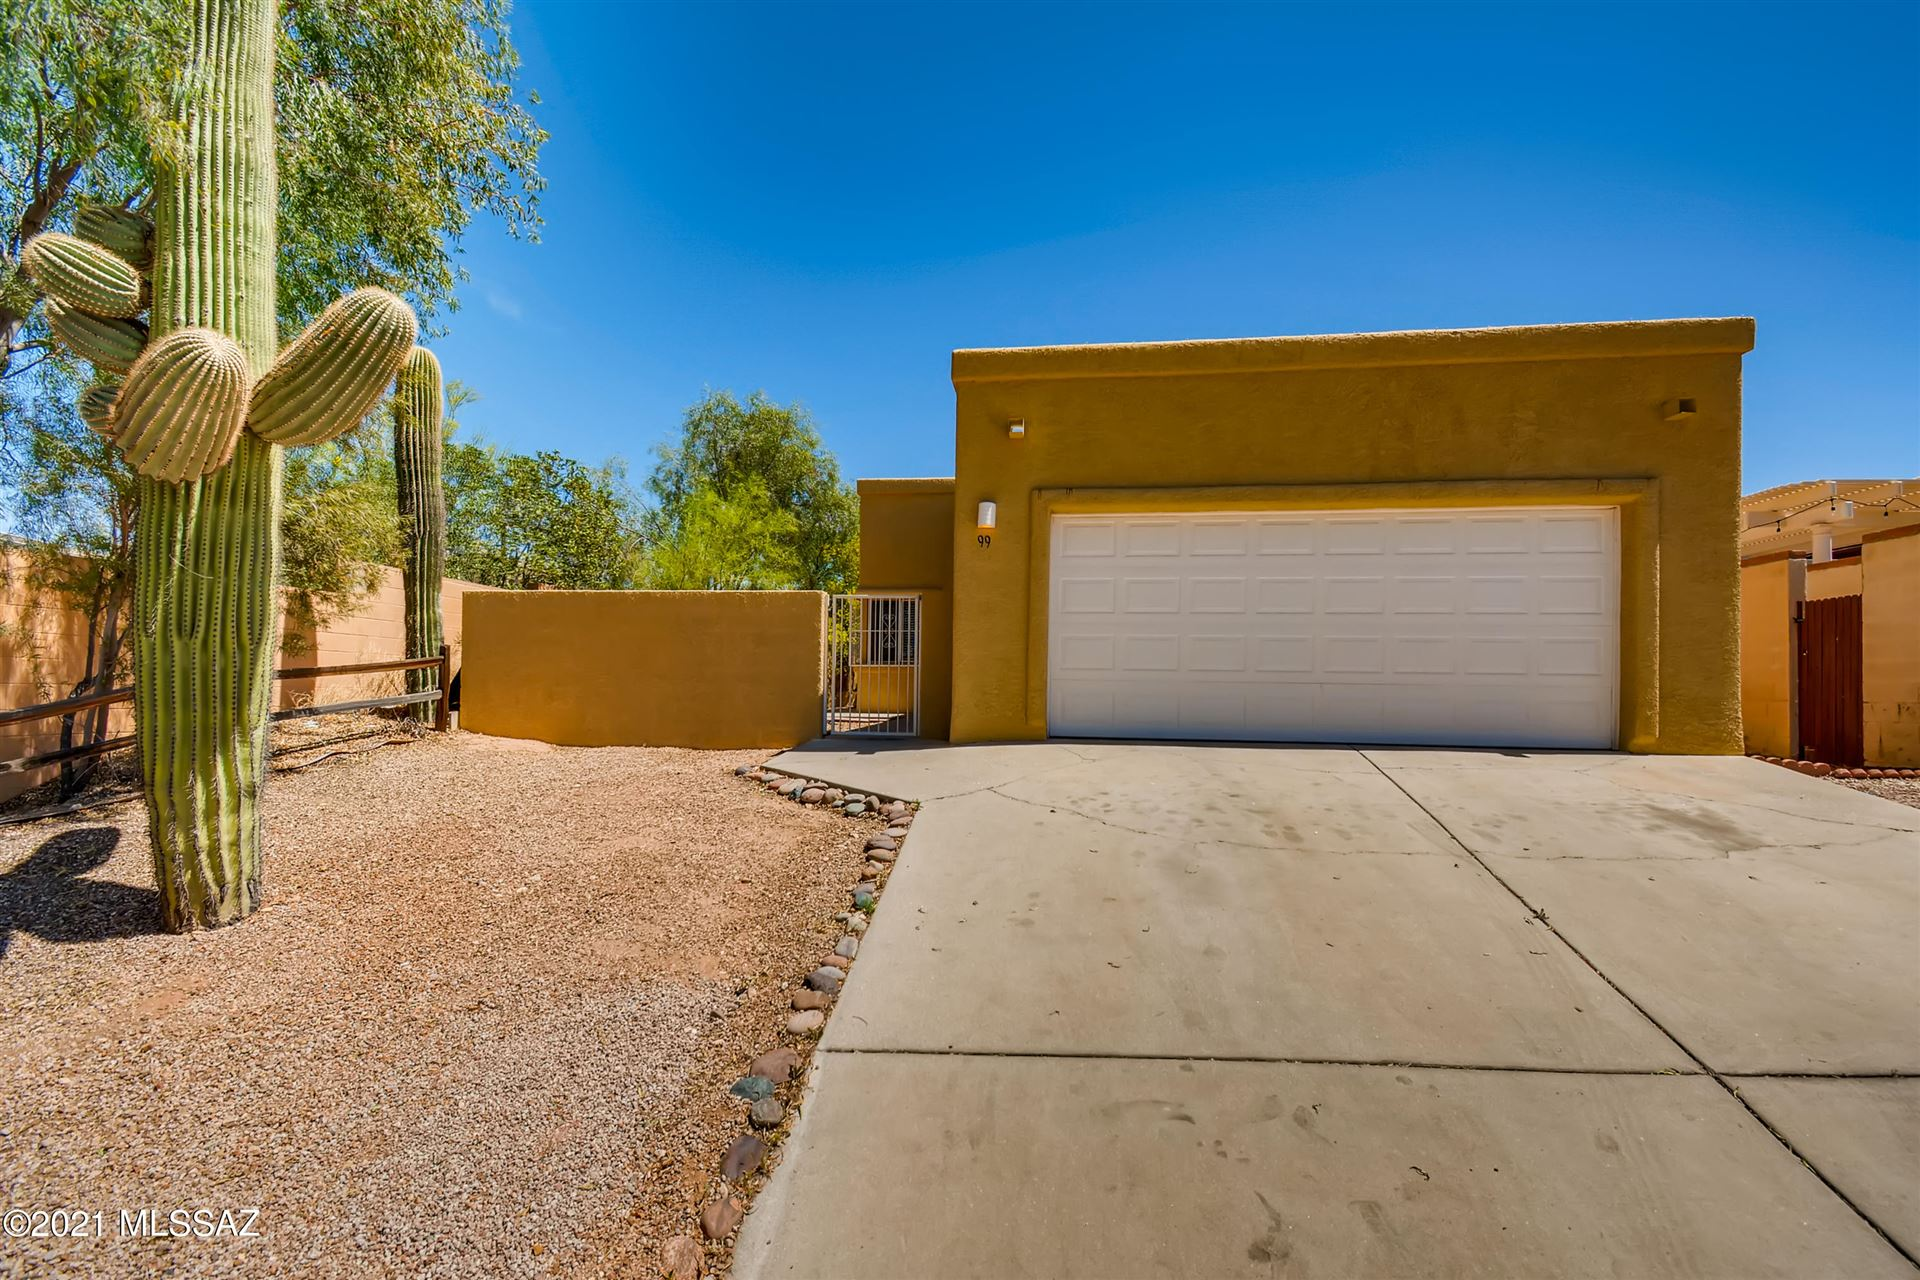 99 S Montego Drive, Tucson, AZ 85710 - MLS#: 22109254